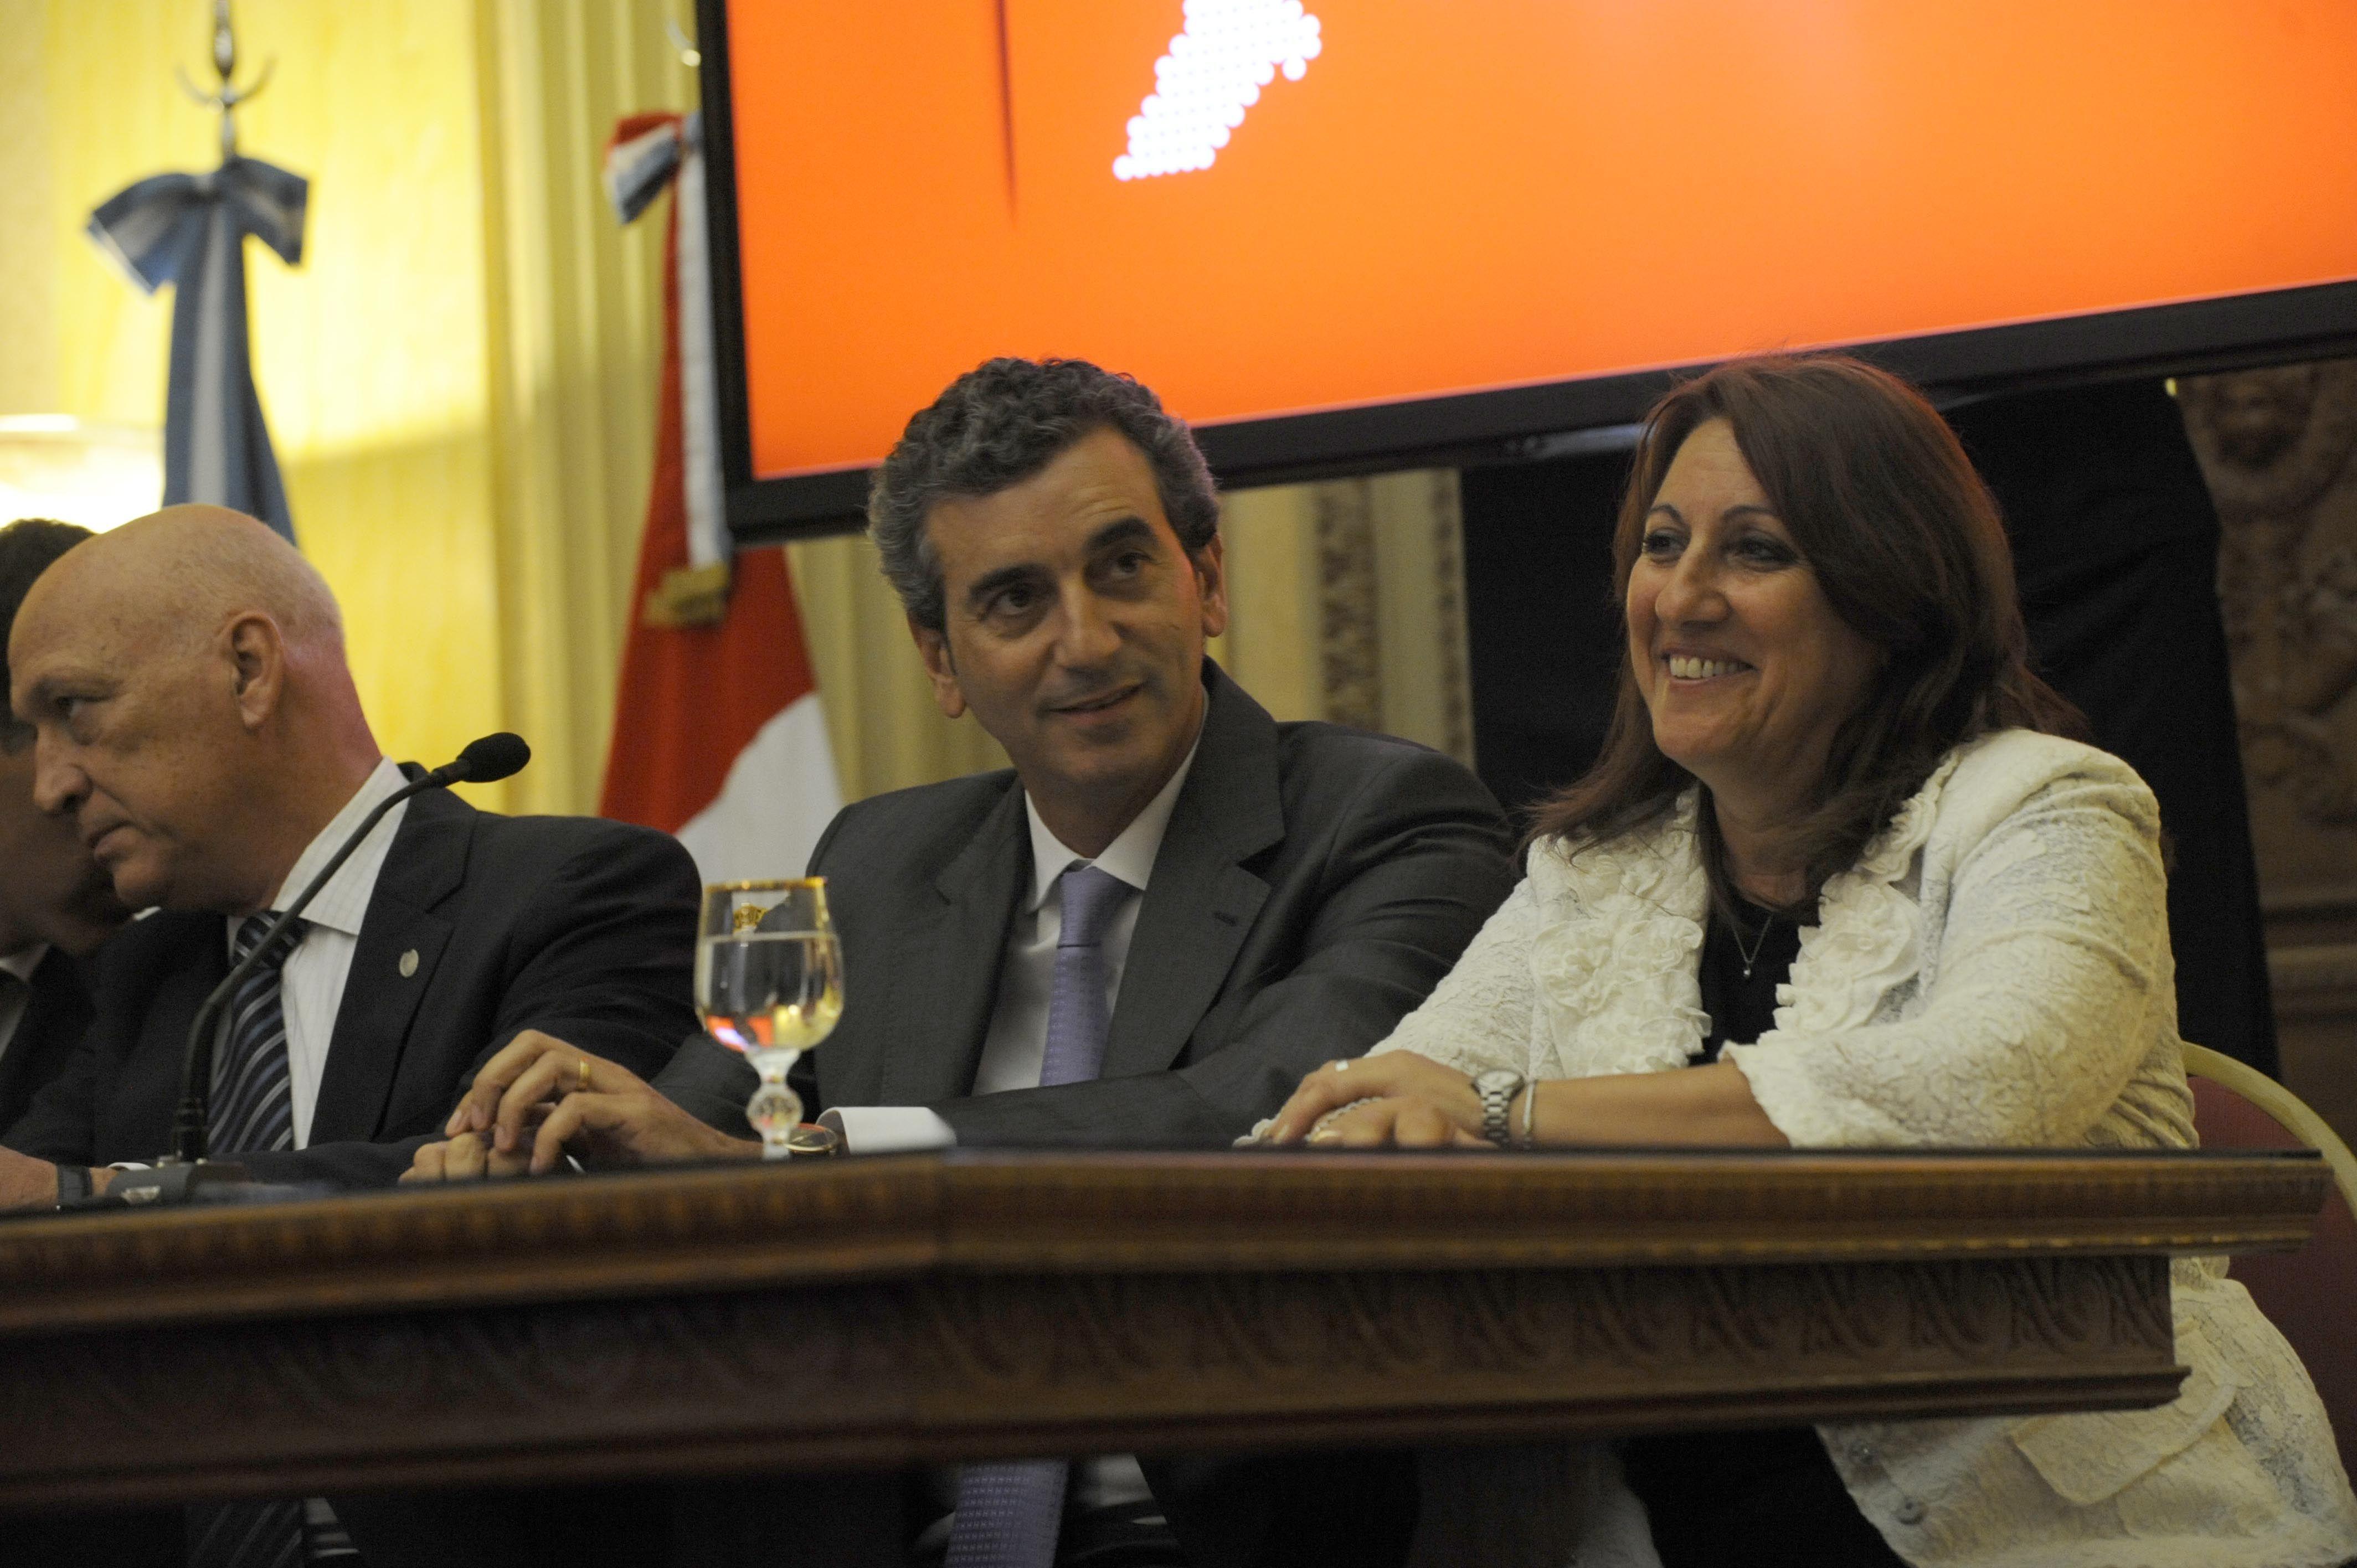 La intendenta celebró el arribo del tren a Rosario. (Foto: N. Juncos)